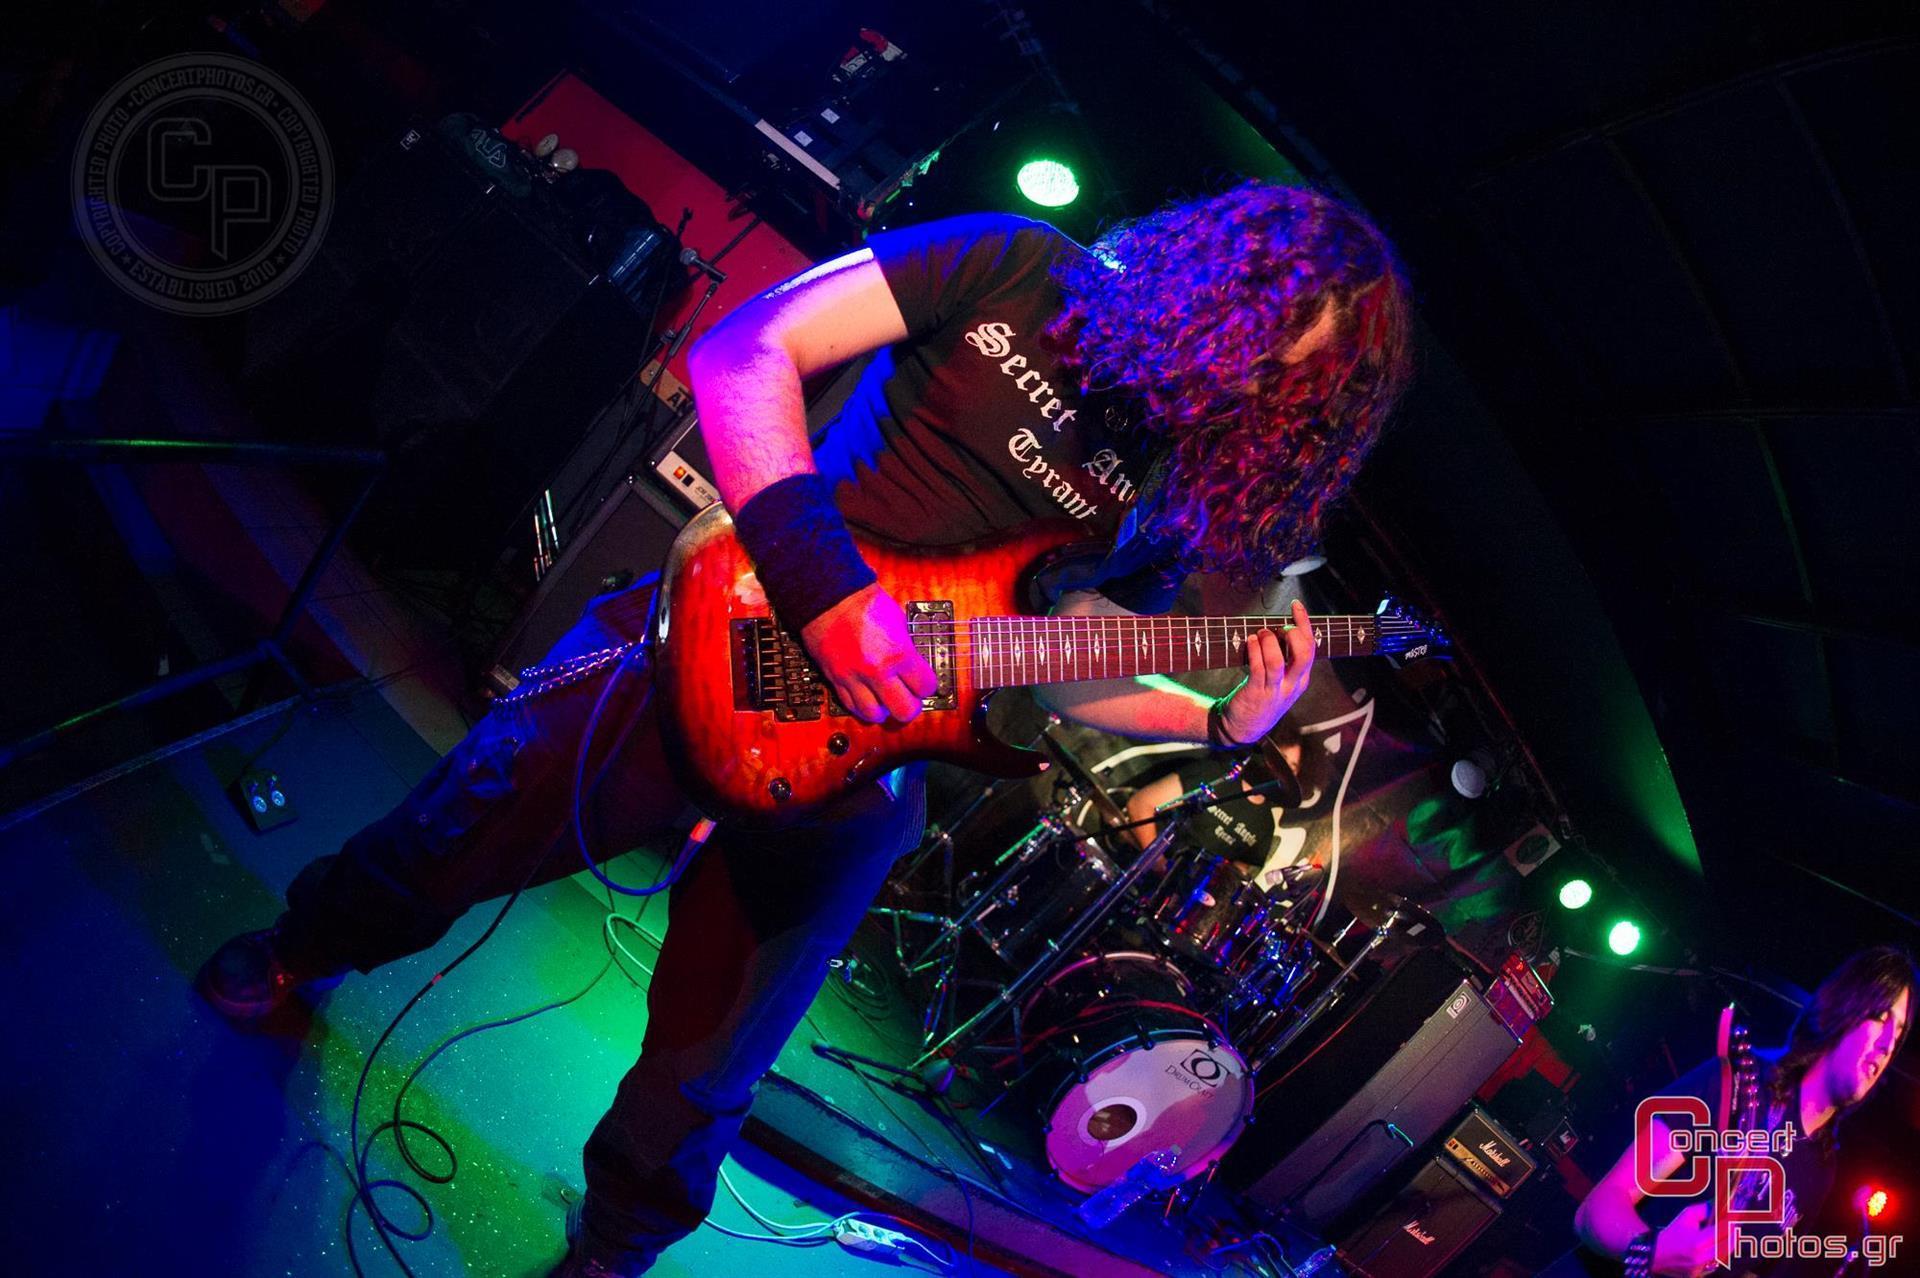 Battle Of The Bands Athens - Leg 3- photographer:  - ConcertPhotos - 20150104_2321_30